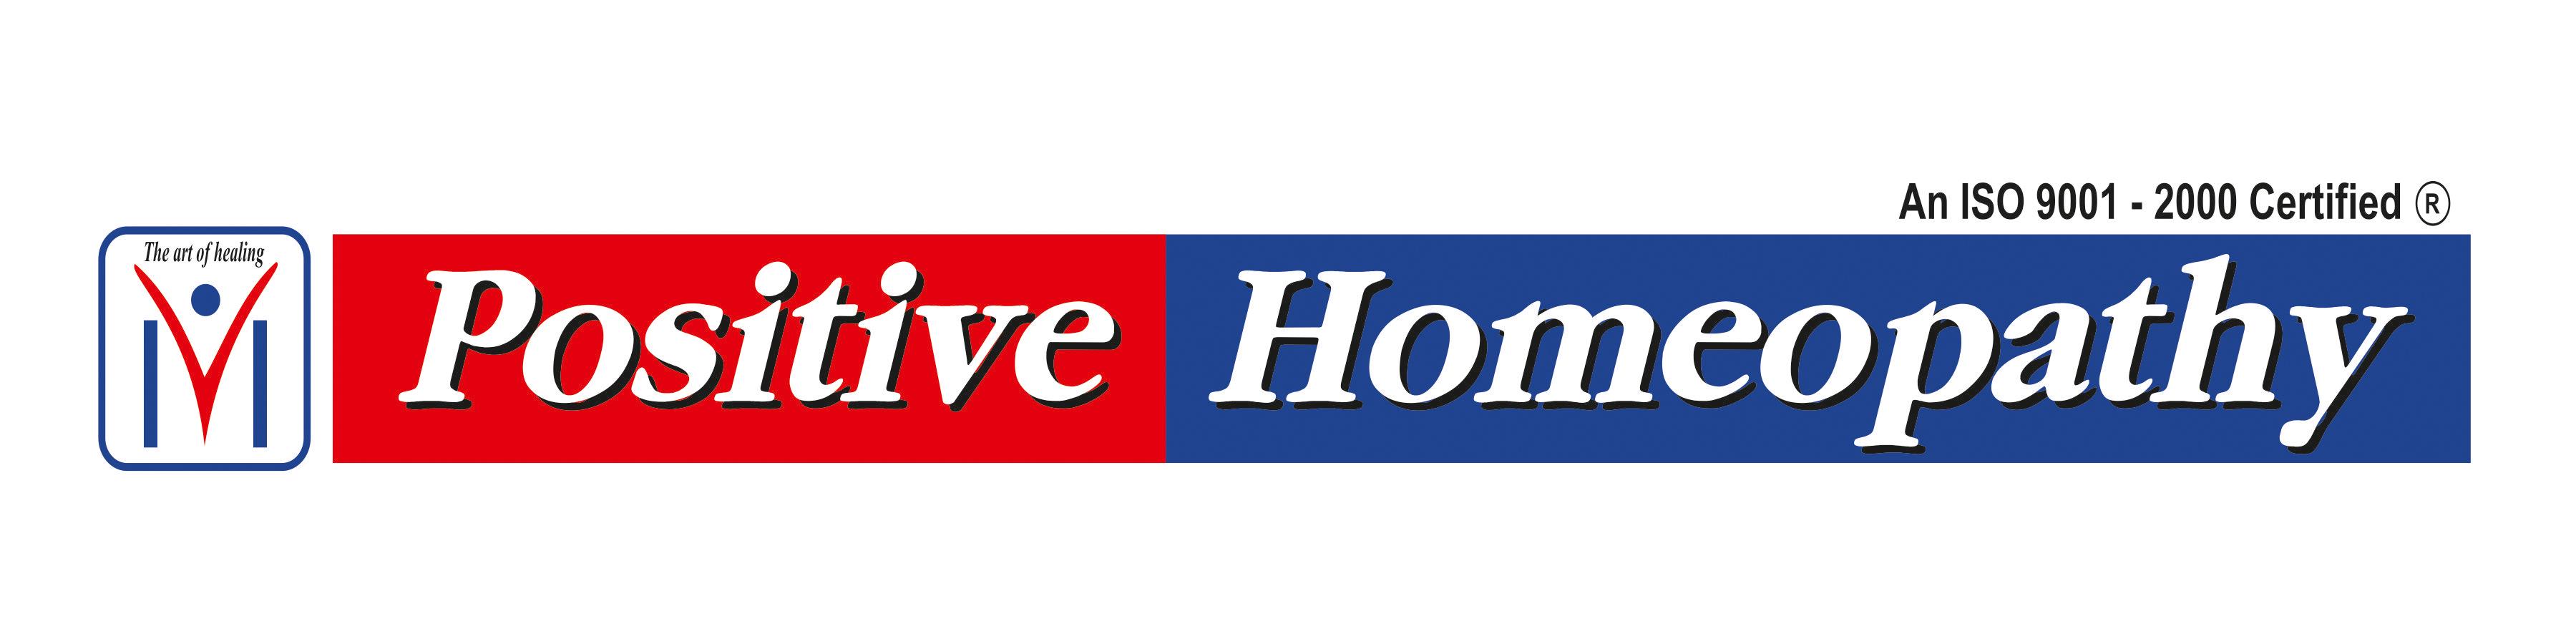 Positive Homeopathy - Indira Nagar - Bangalore Image